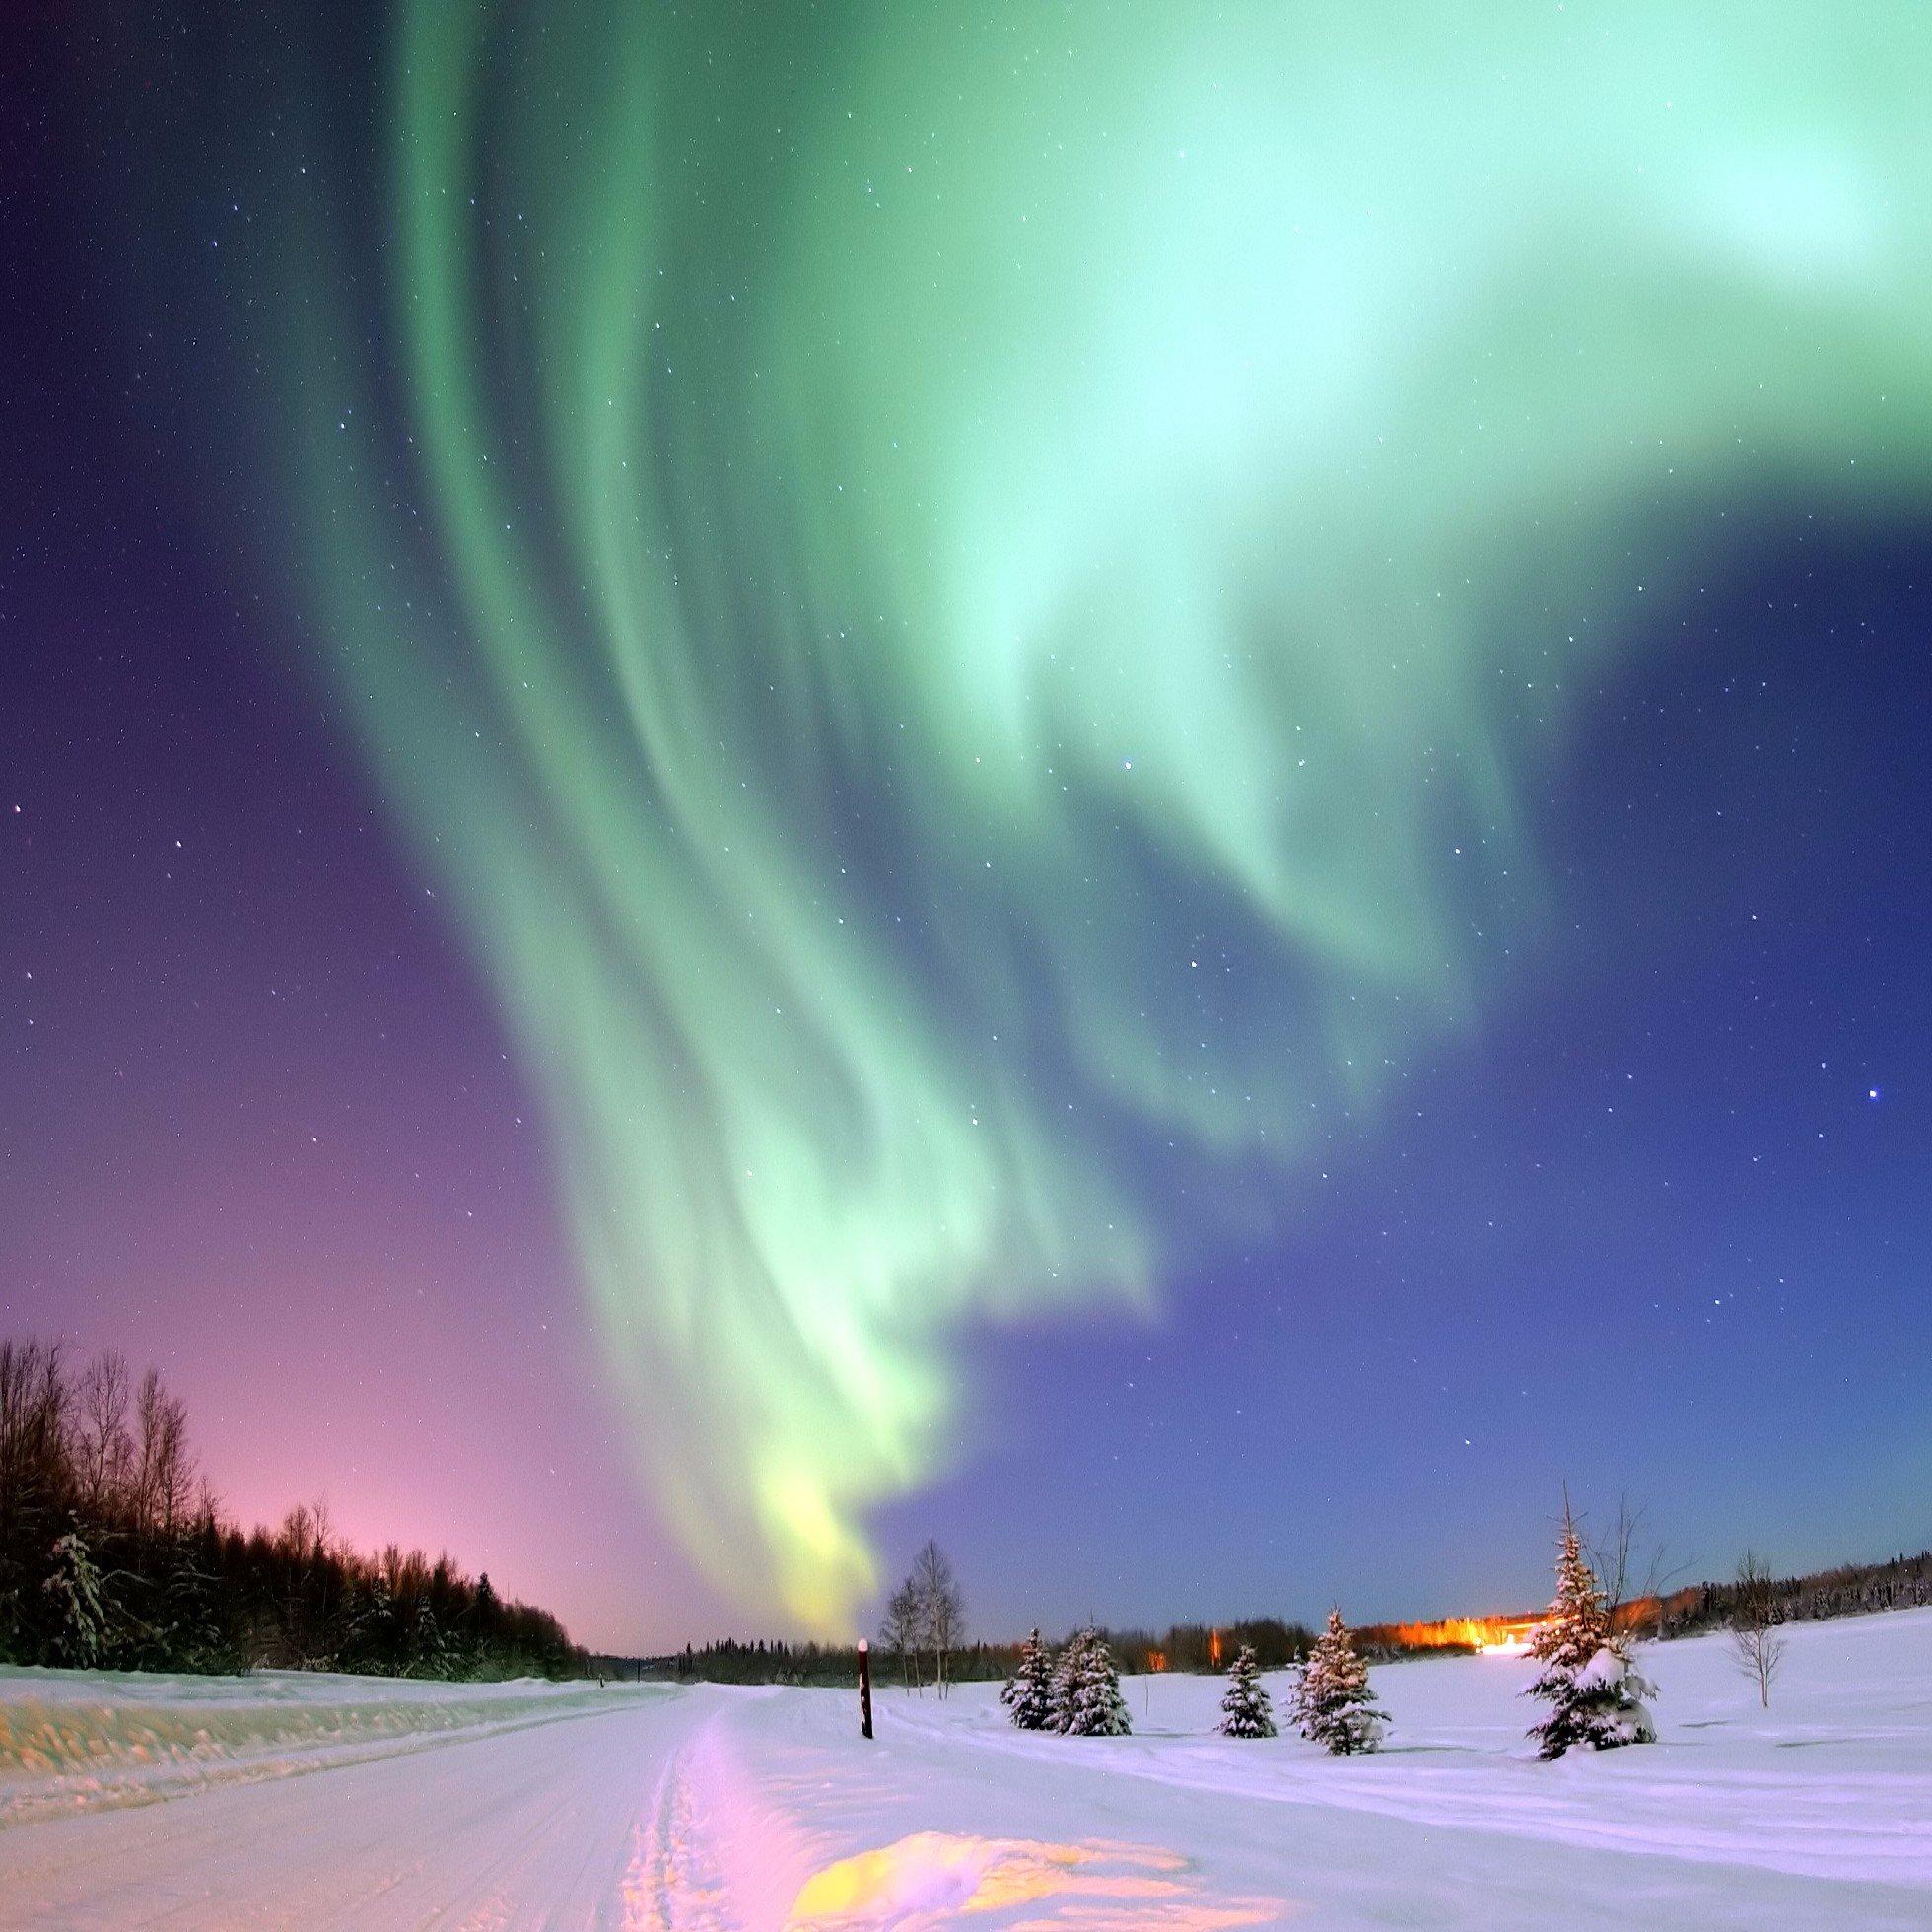 Best Winter Travel Destinations in the US   POPSUGAR Smart Living